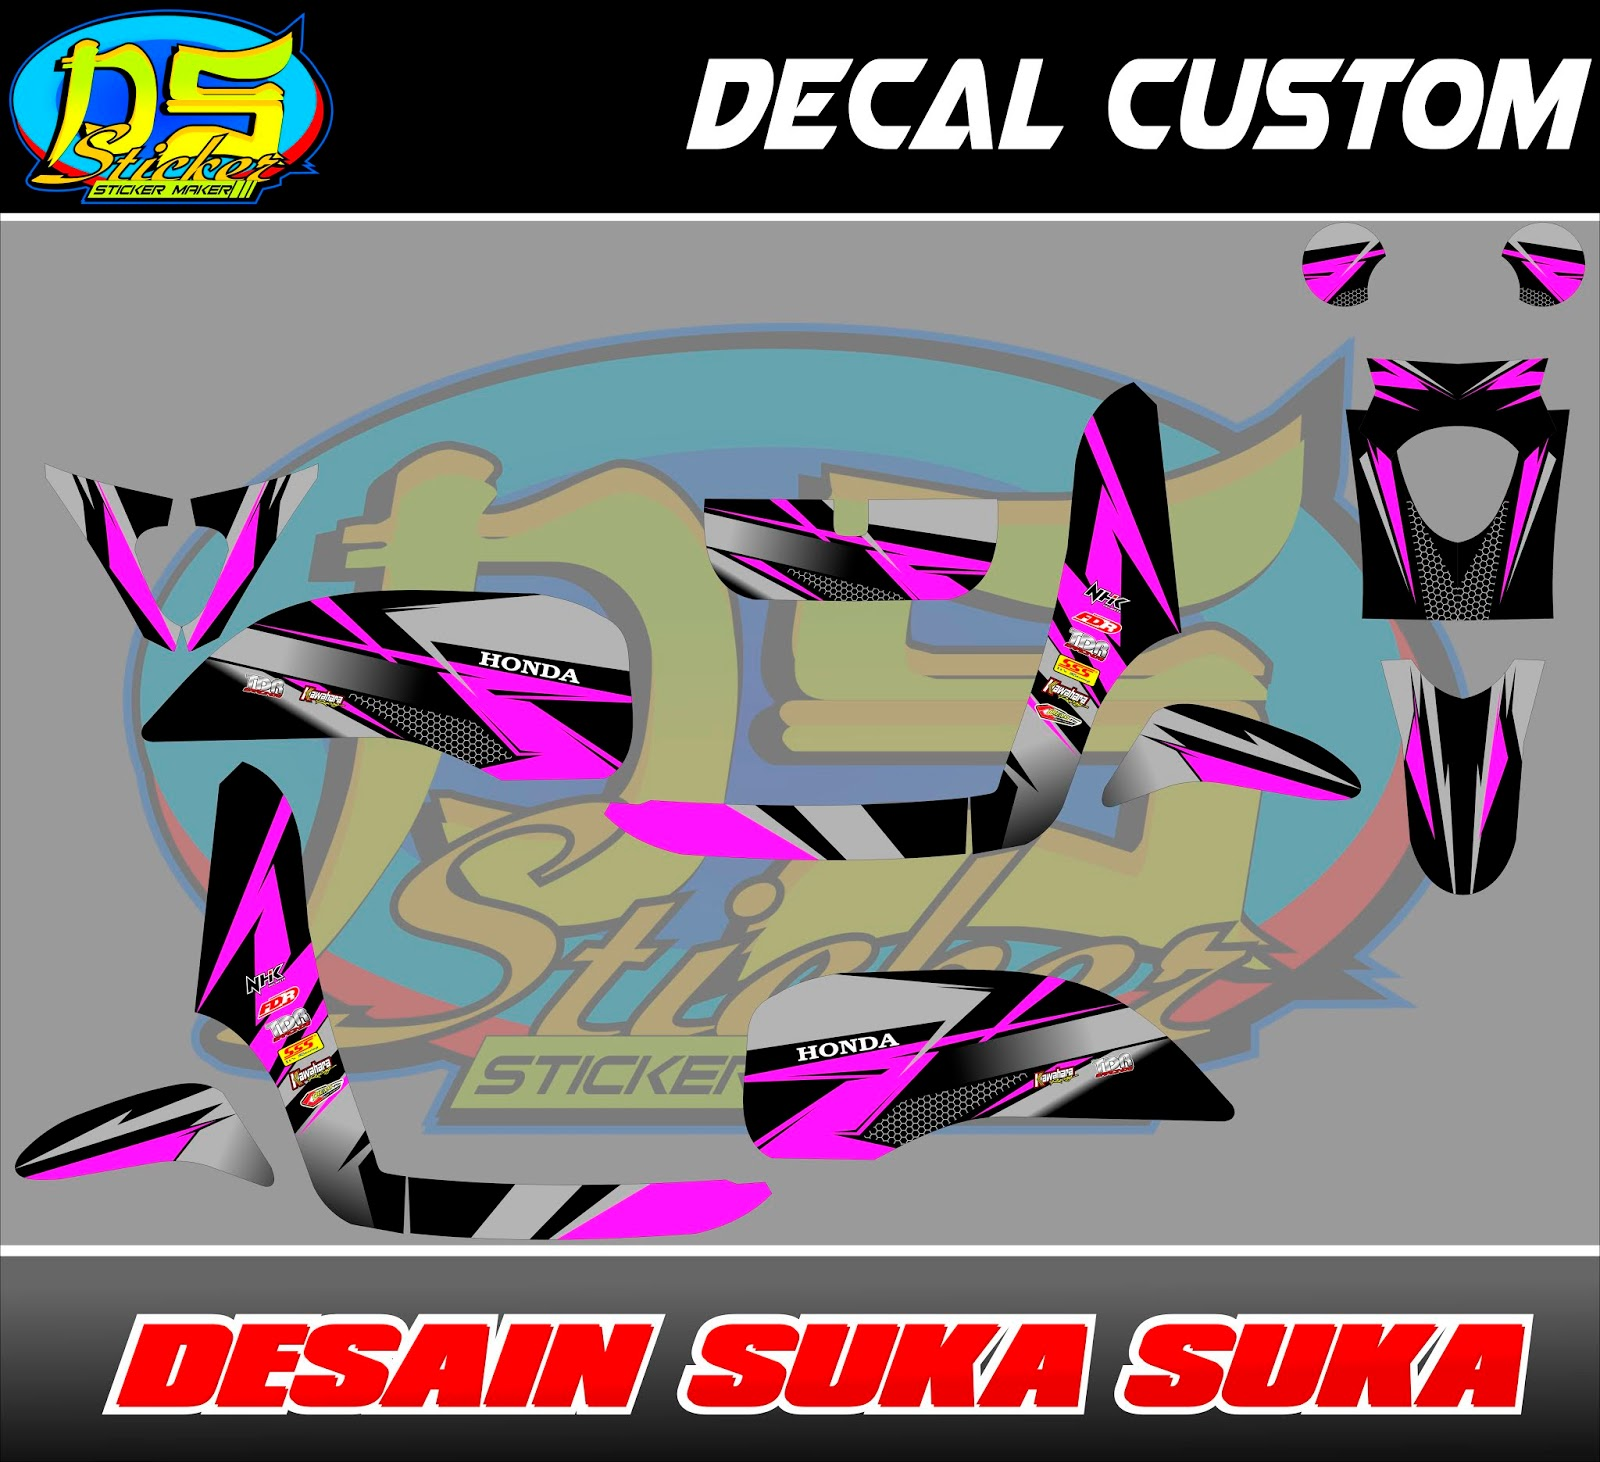 Decal scoopy fi motif pink